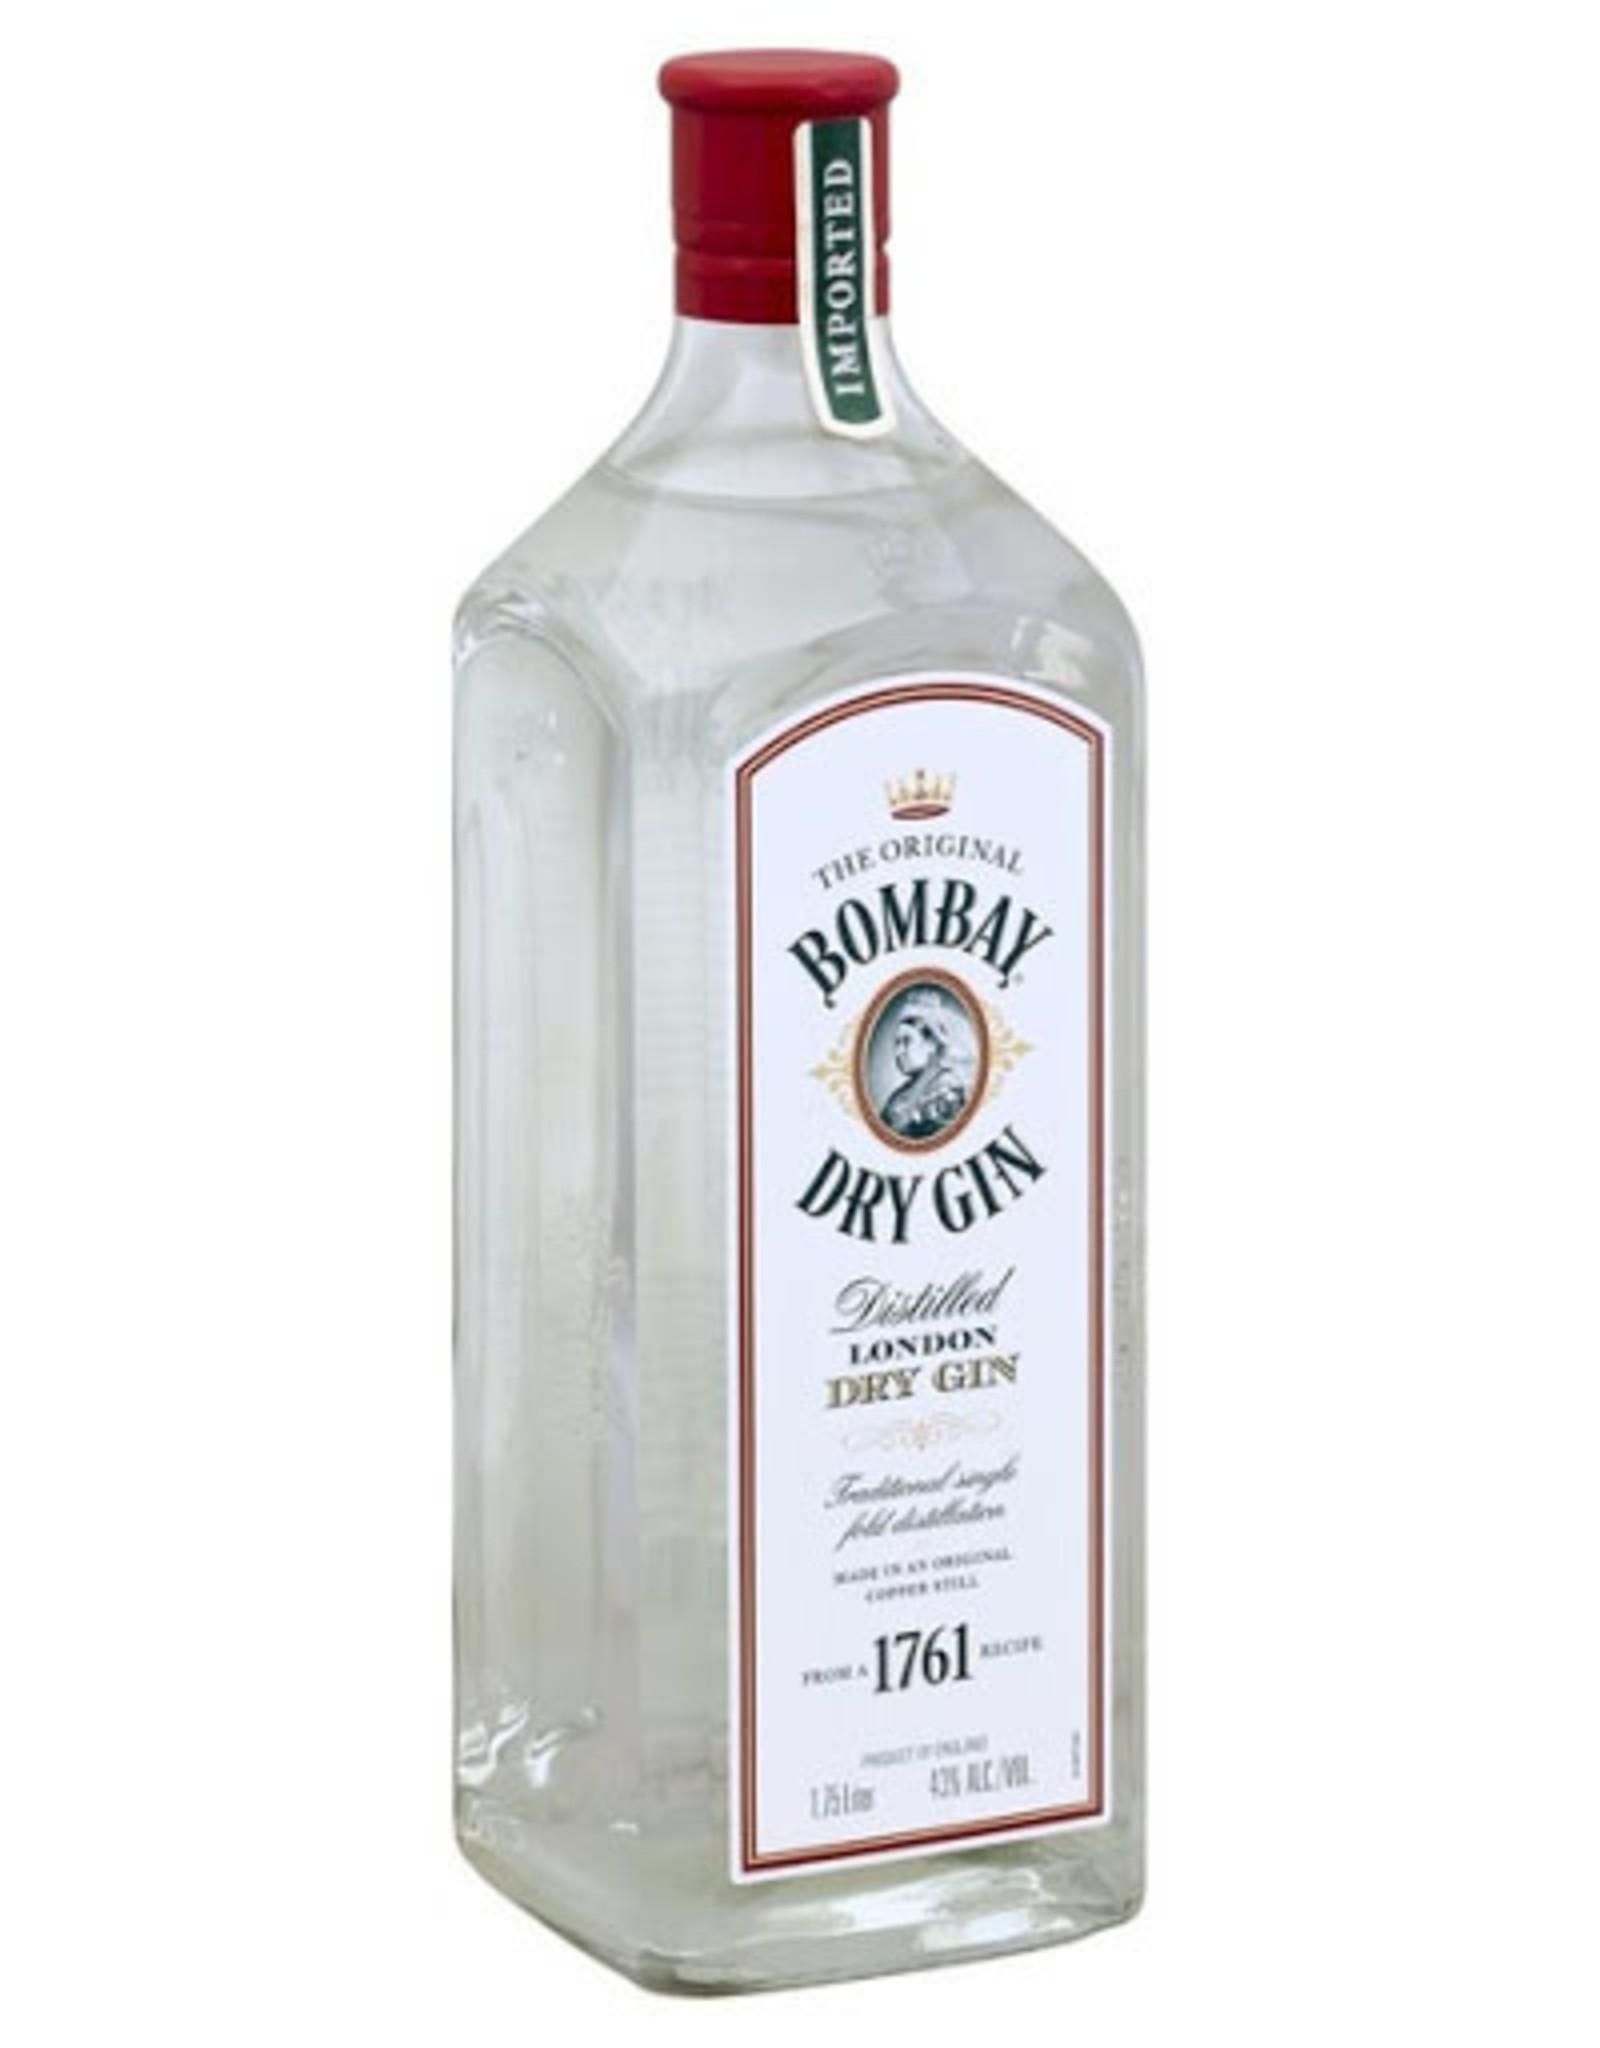 Bombay Bombay Dry Gin Original 1.75L